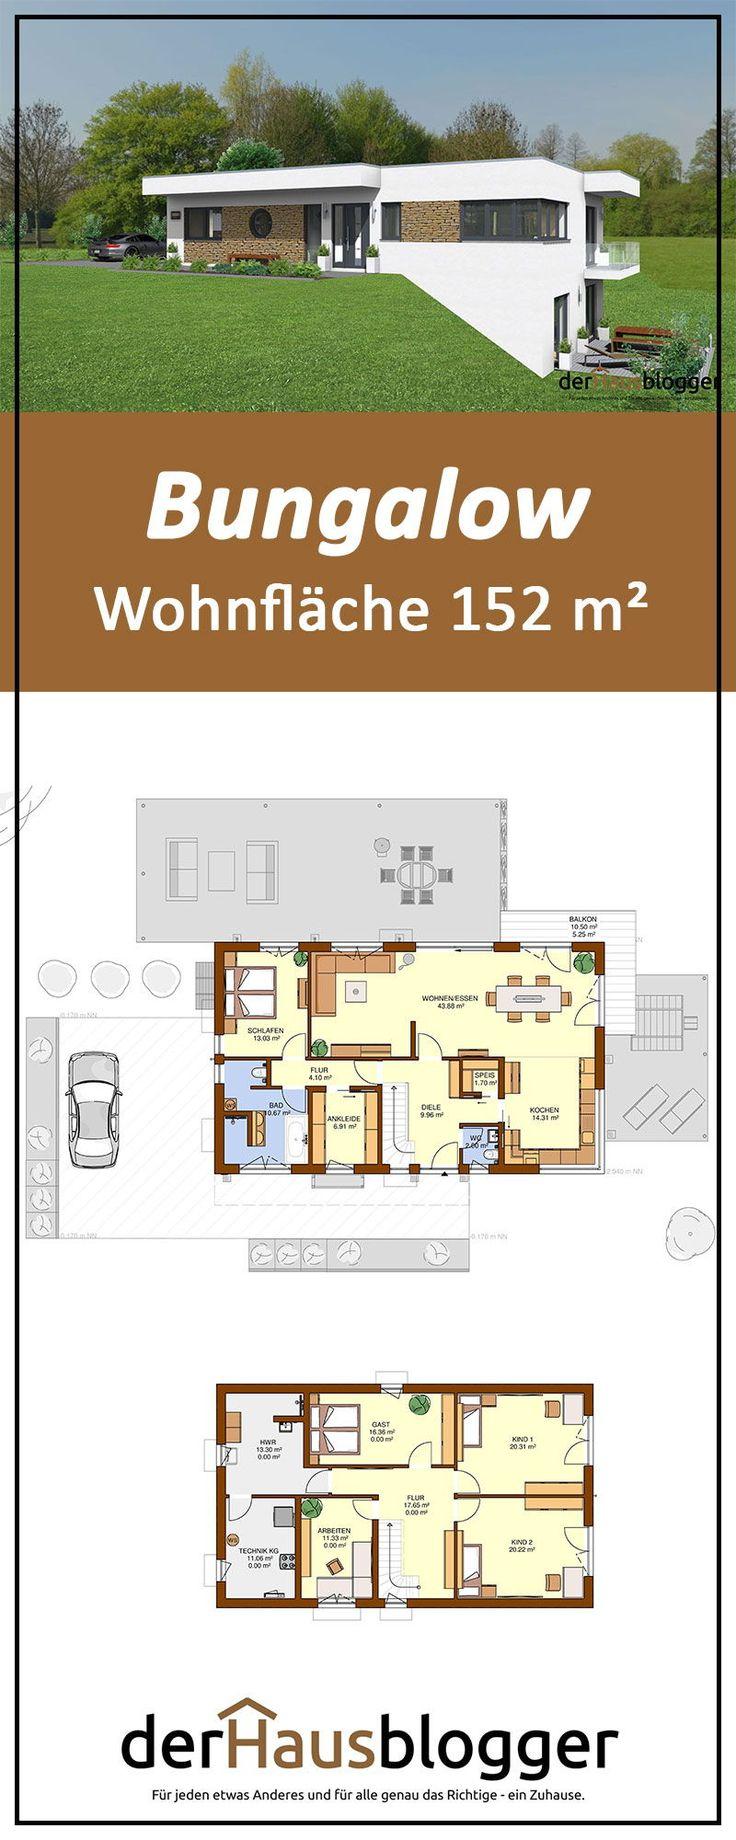 Bungalow 152m² in 2020 Bungalow mit keller, Bungalow und